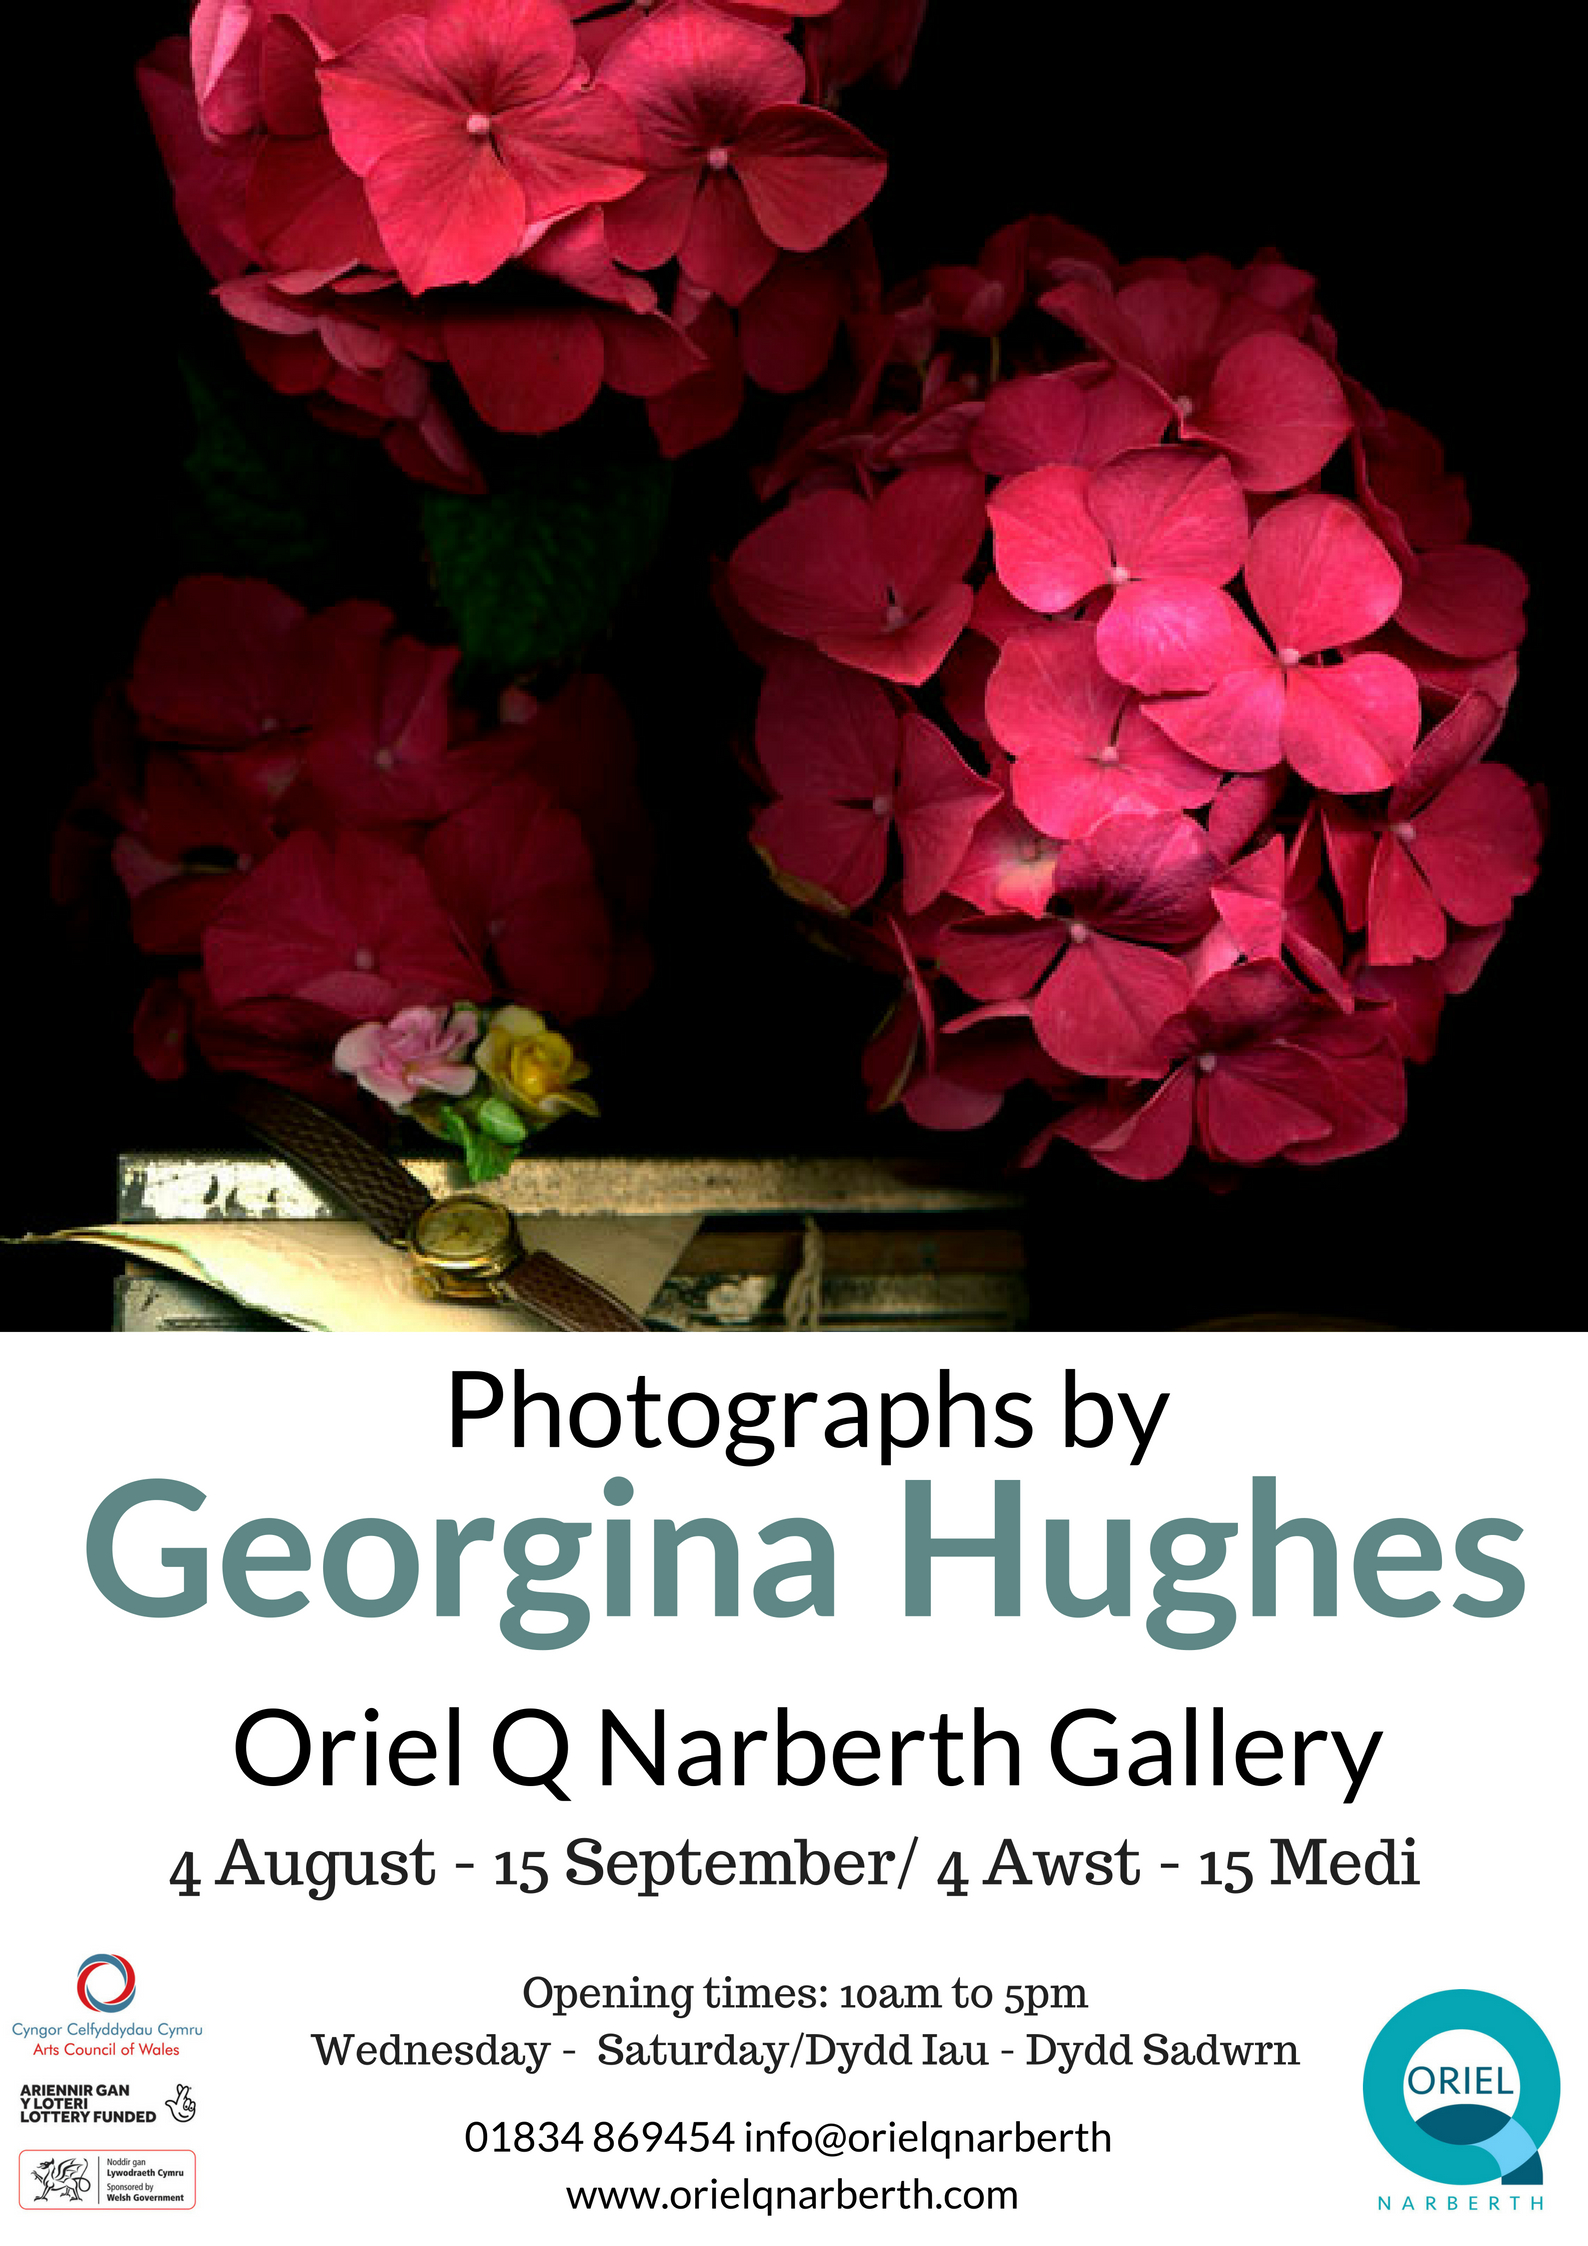 Georgina hughe poster.jpg